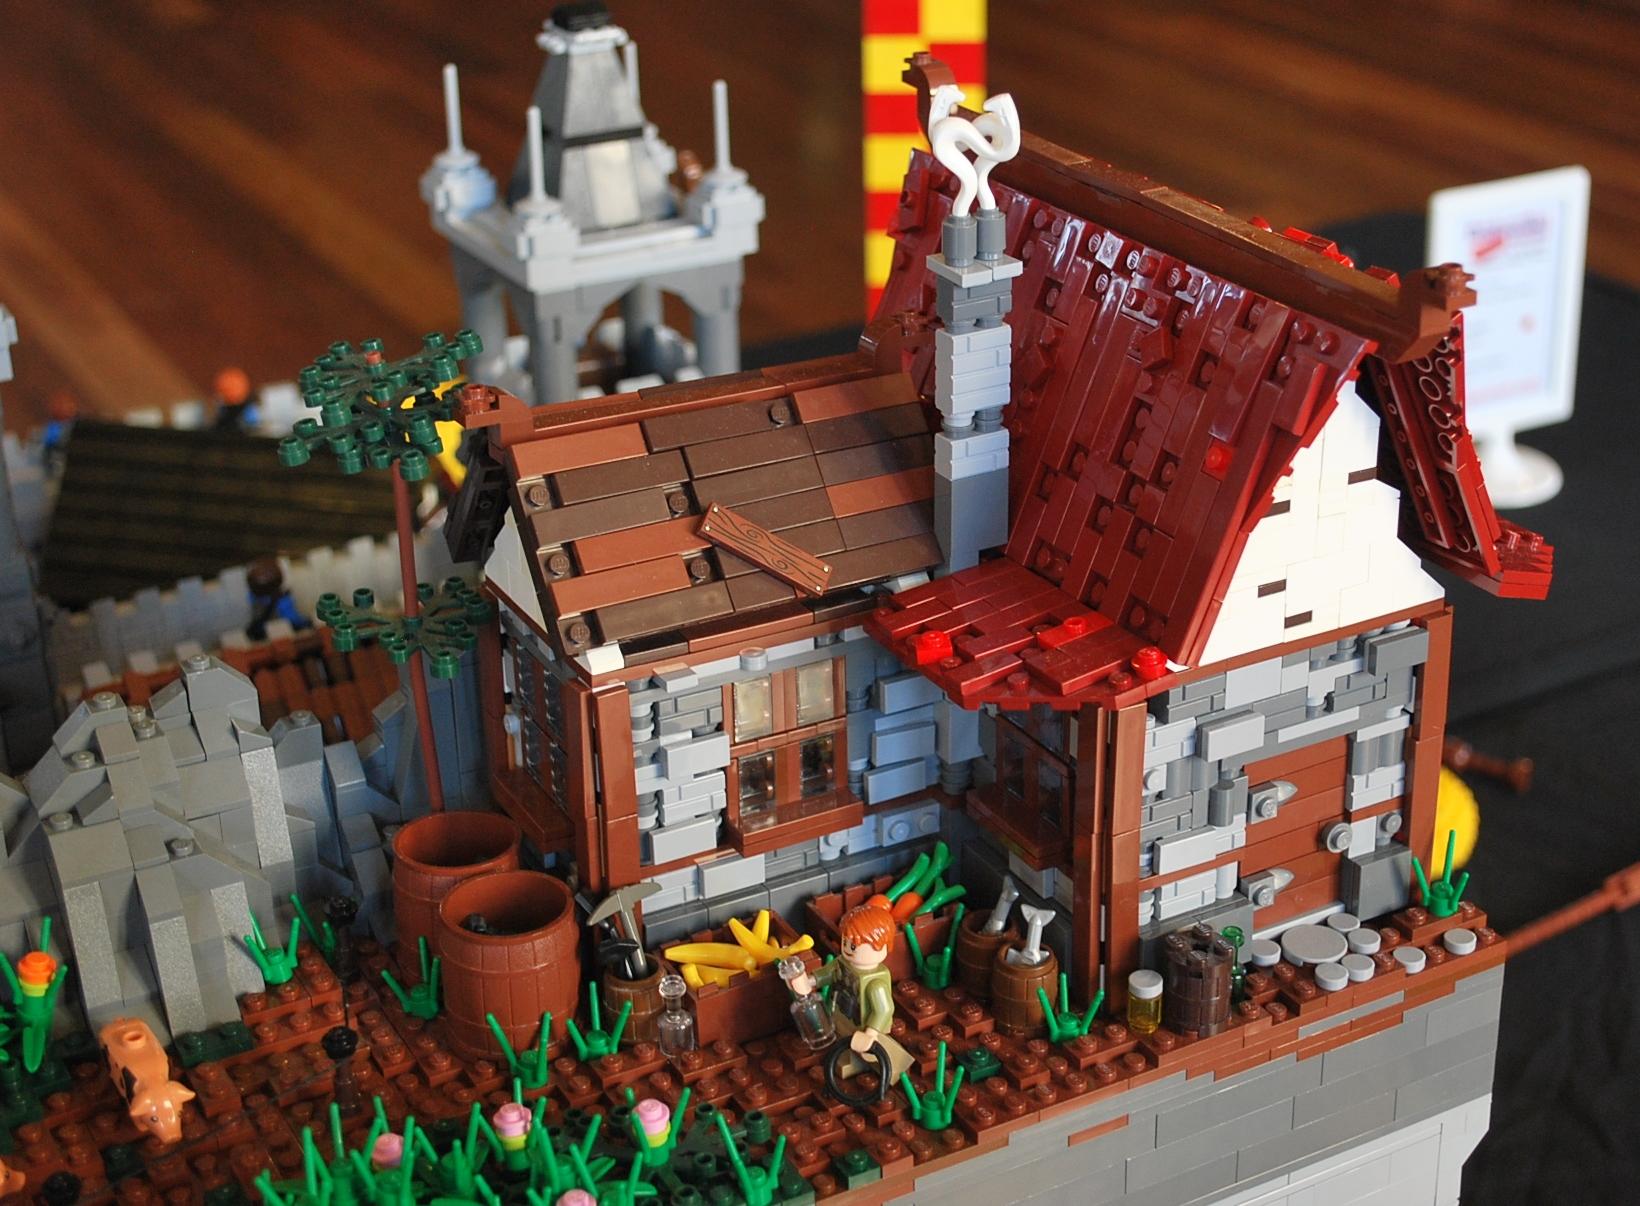 Wallpaper Water Rock Wall Bricks House Lego Castle River